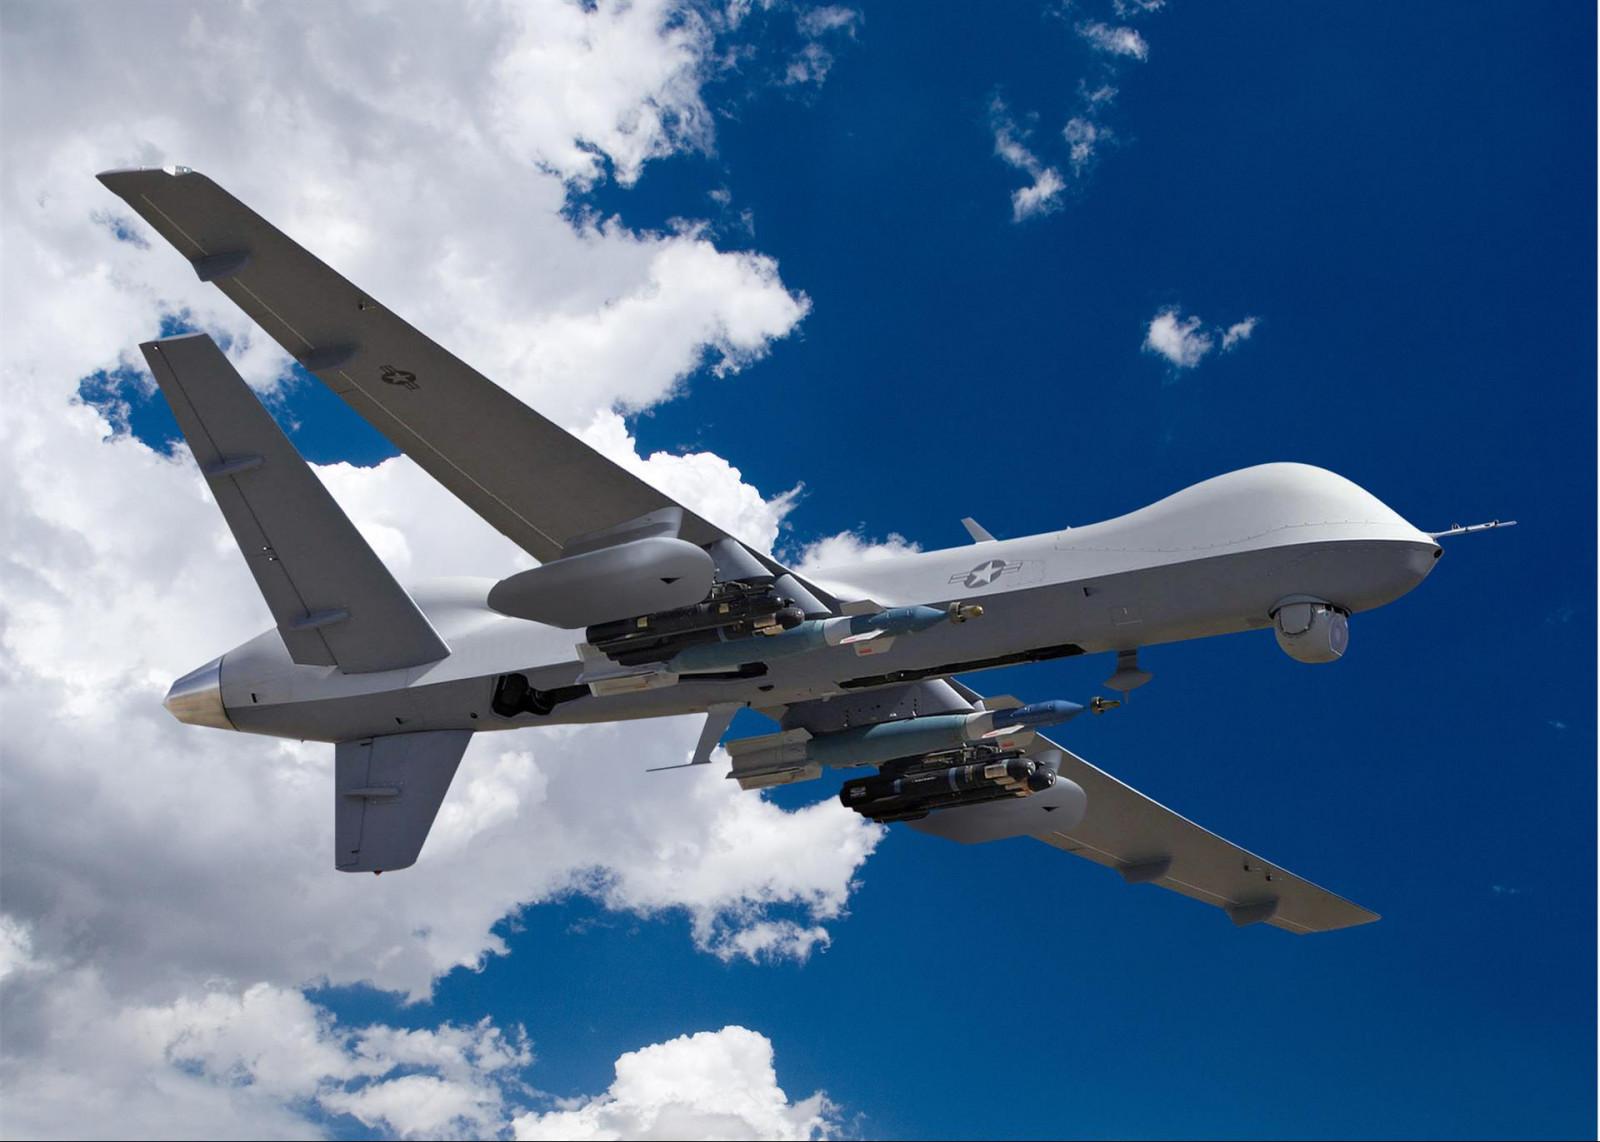 https://c.wallhere.com/photos/6e/c7/General_Atomics_MQ_9_Reaper_US_Air_Force_AGM_114_Hellfire-1153425.jpg!d